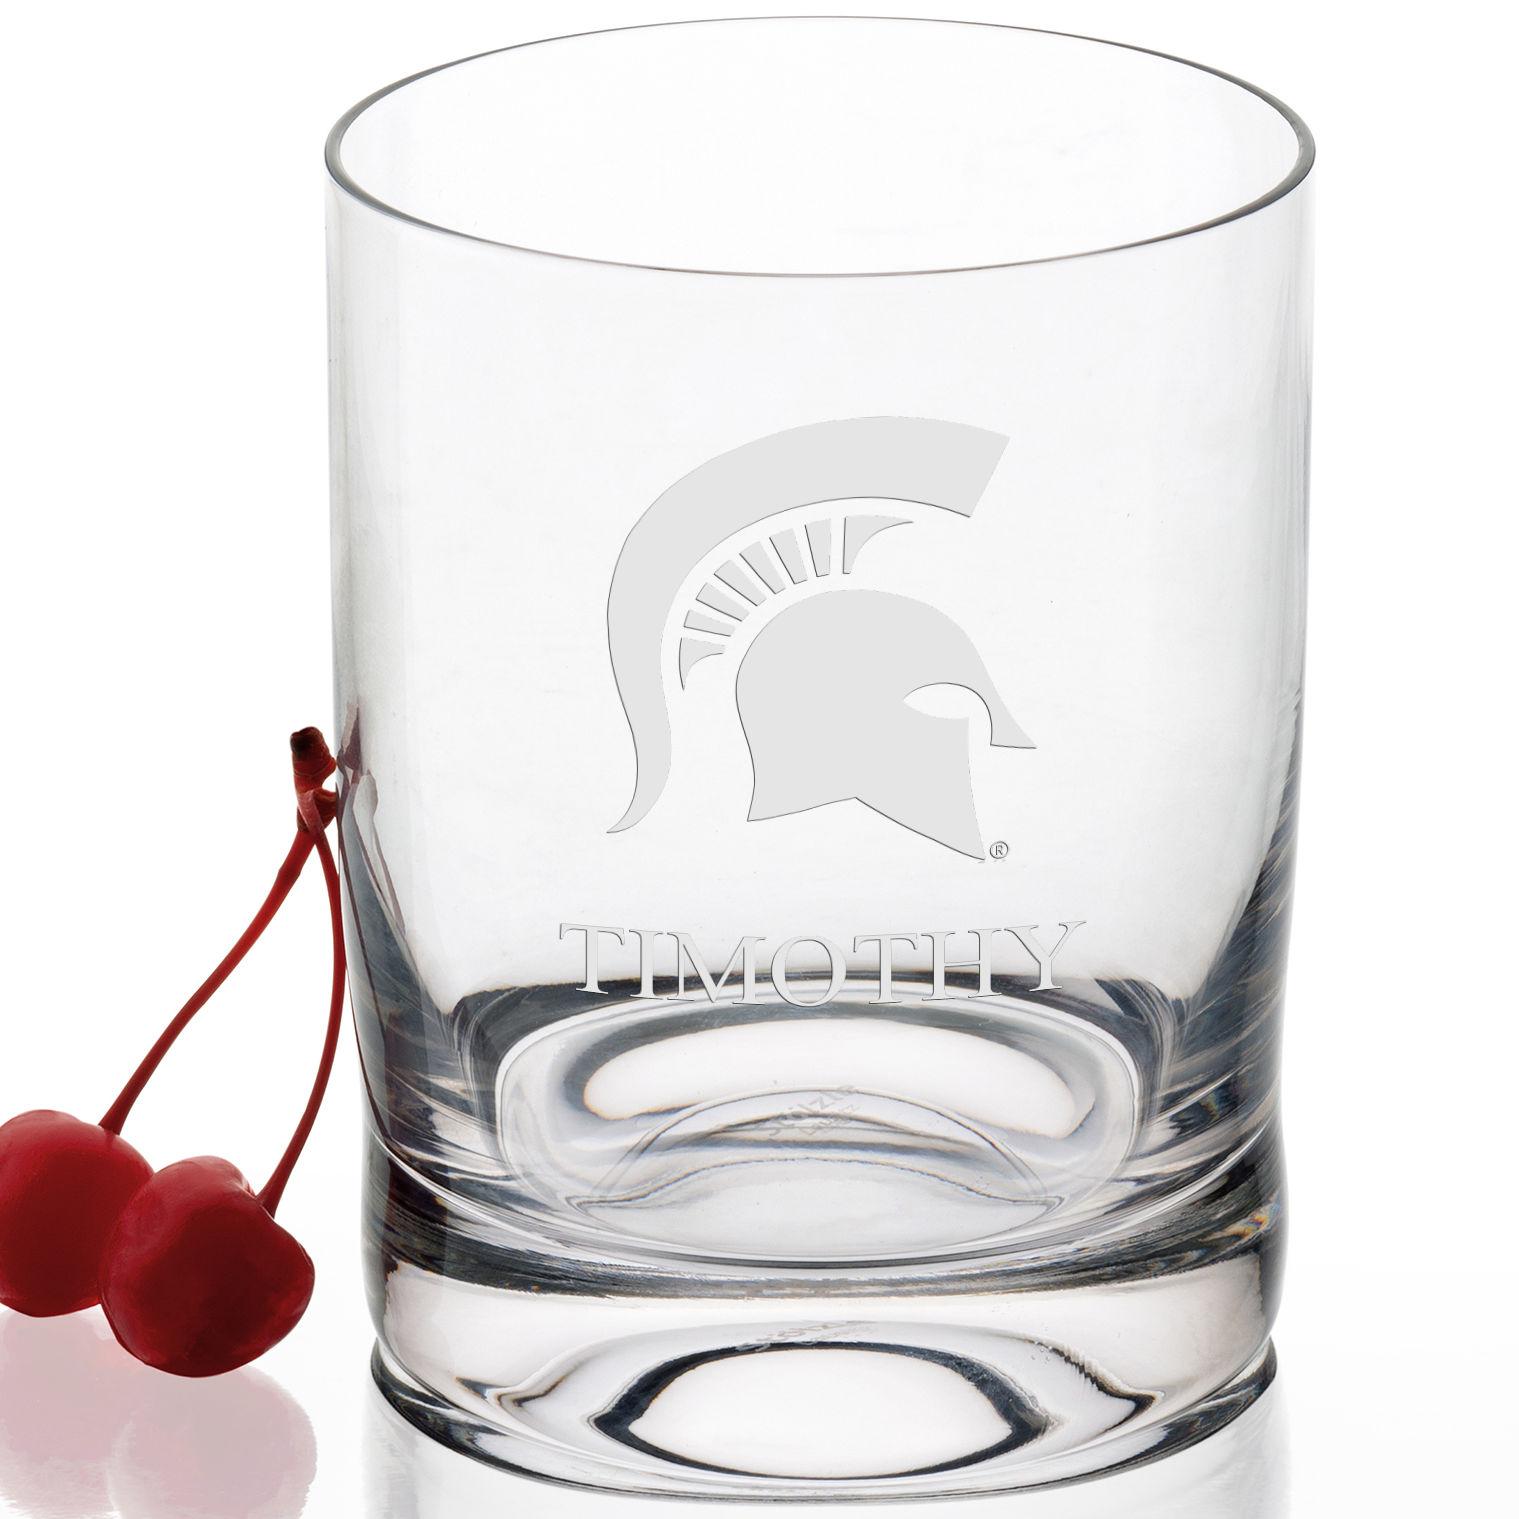 Michigan State University Tumbler Glasses - Set of 4 - Image 2